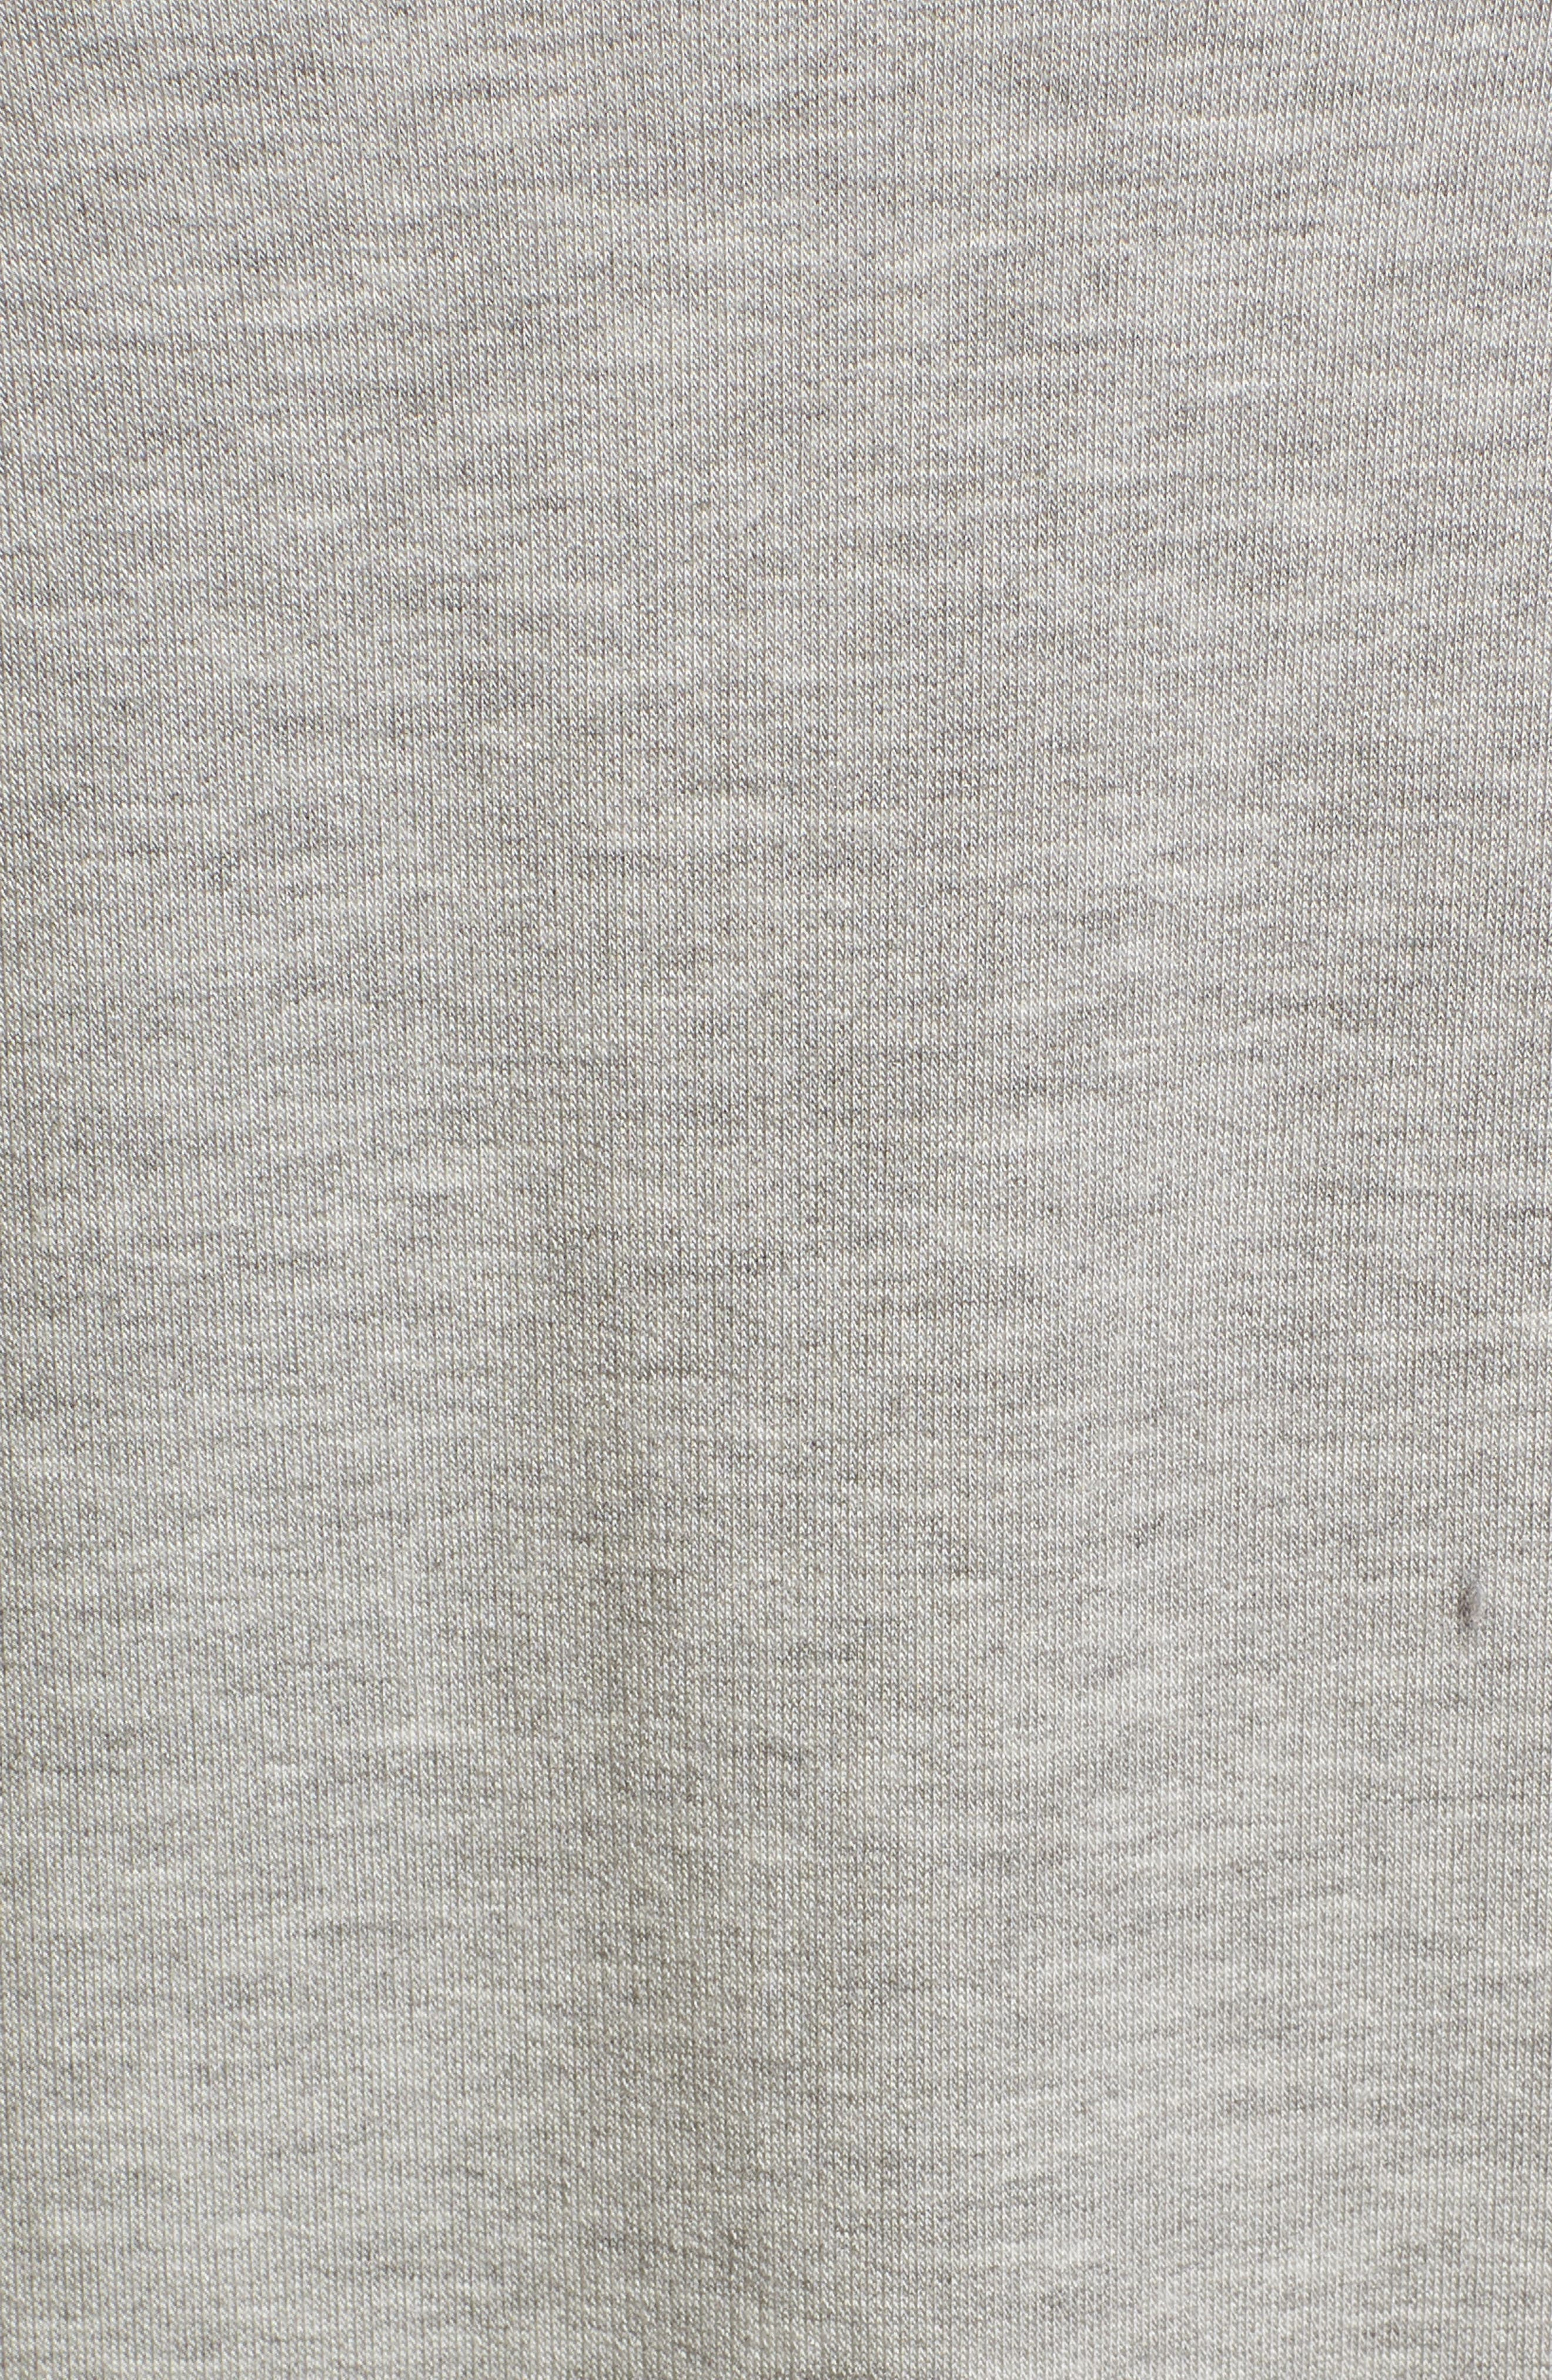 Toro Tie Front Top,                             Alternate thumbnail 5, color,                             032